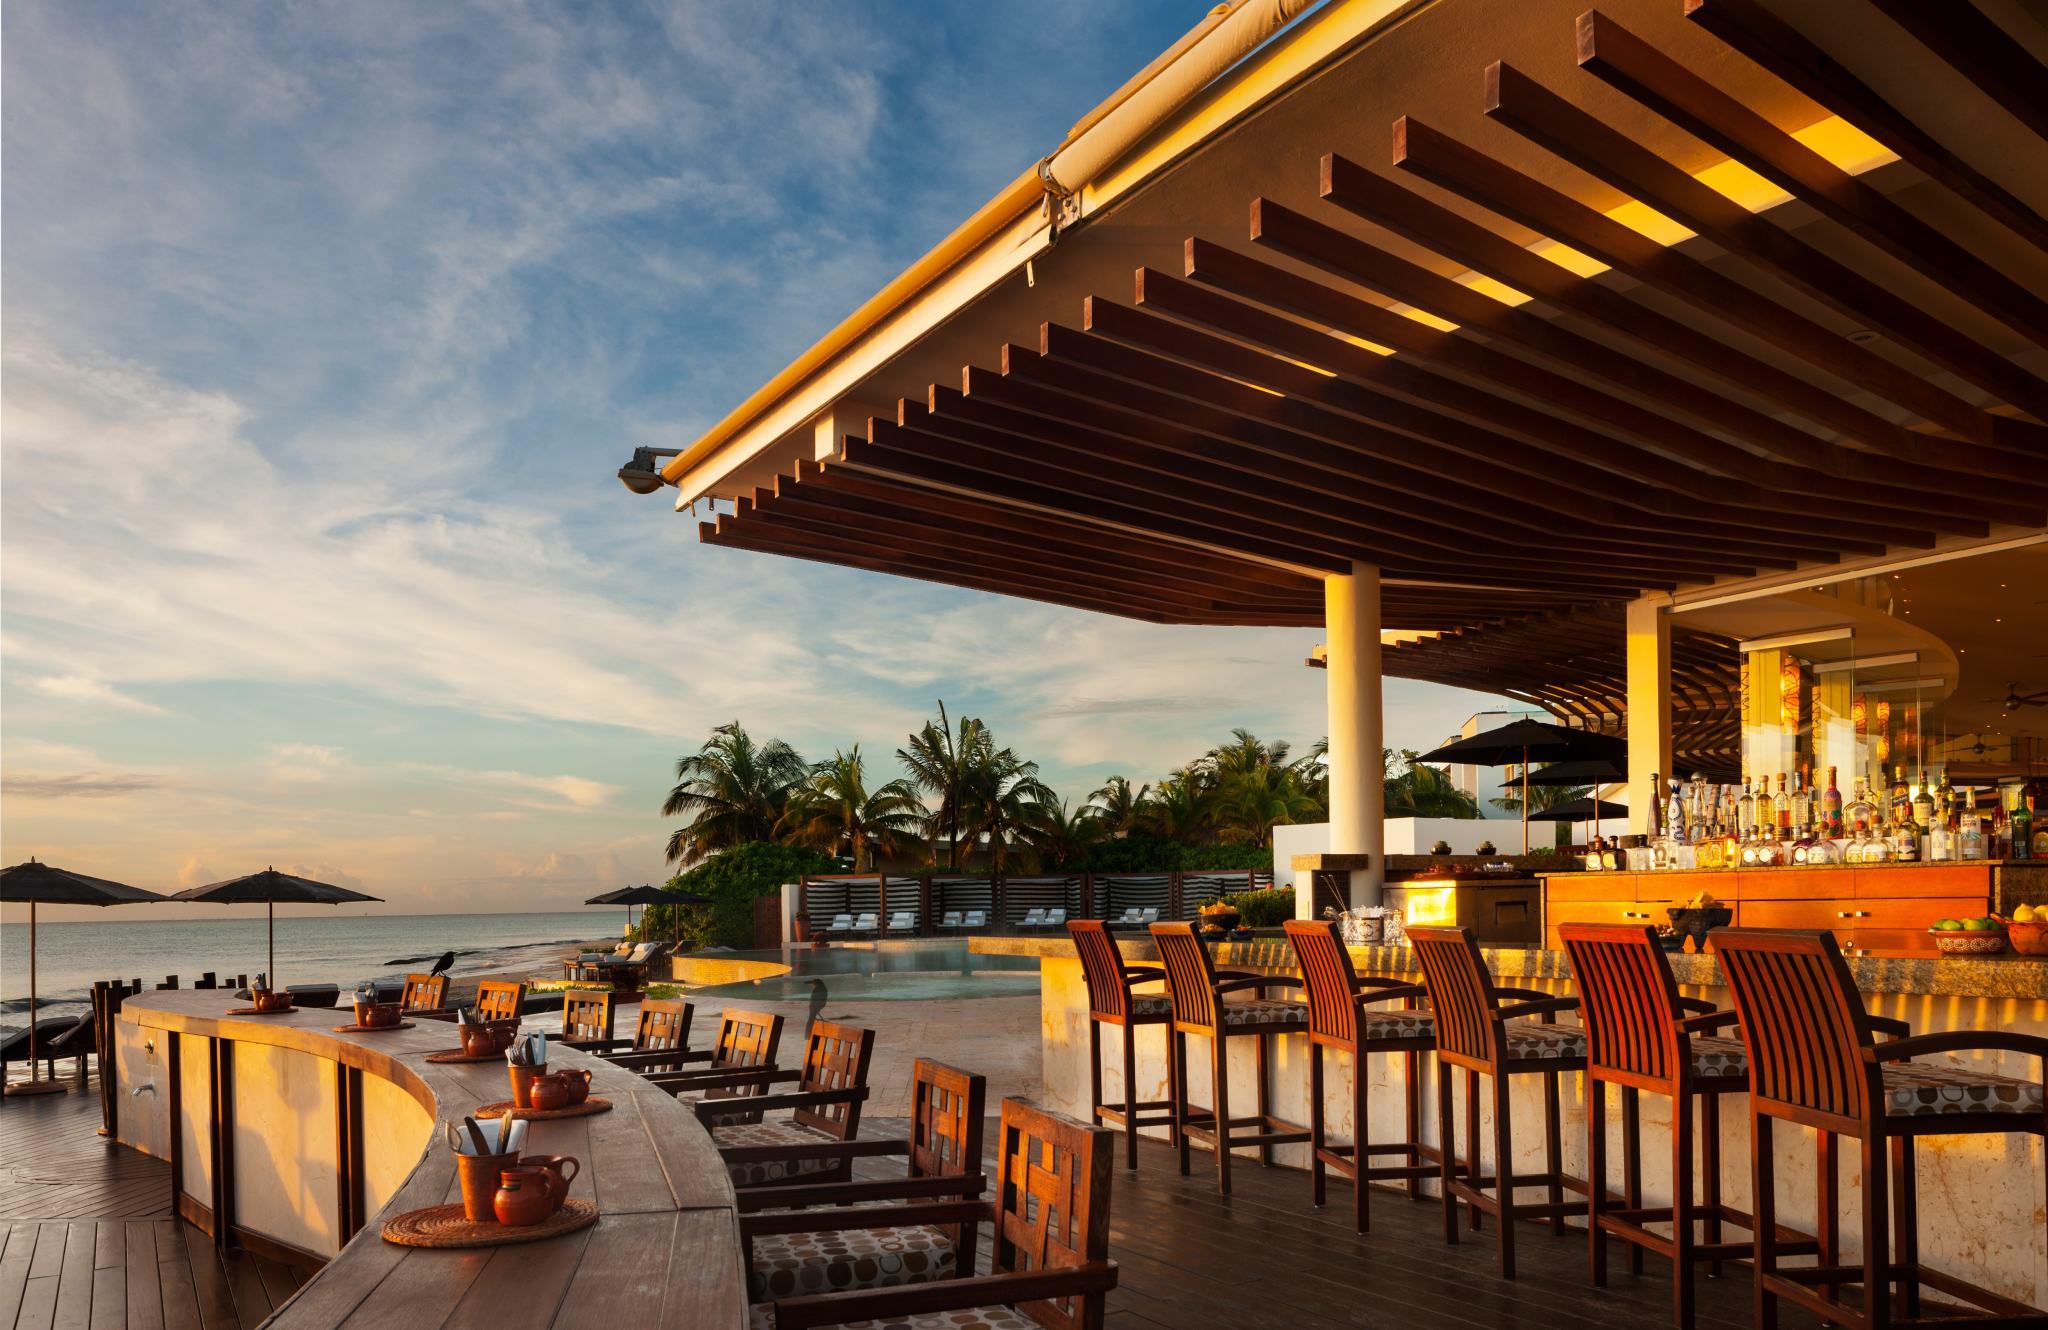 Rosewood_Mayakoba08-daylight---Punta-Bonita-Bar.ashx.jpg